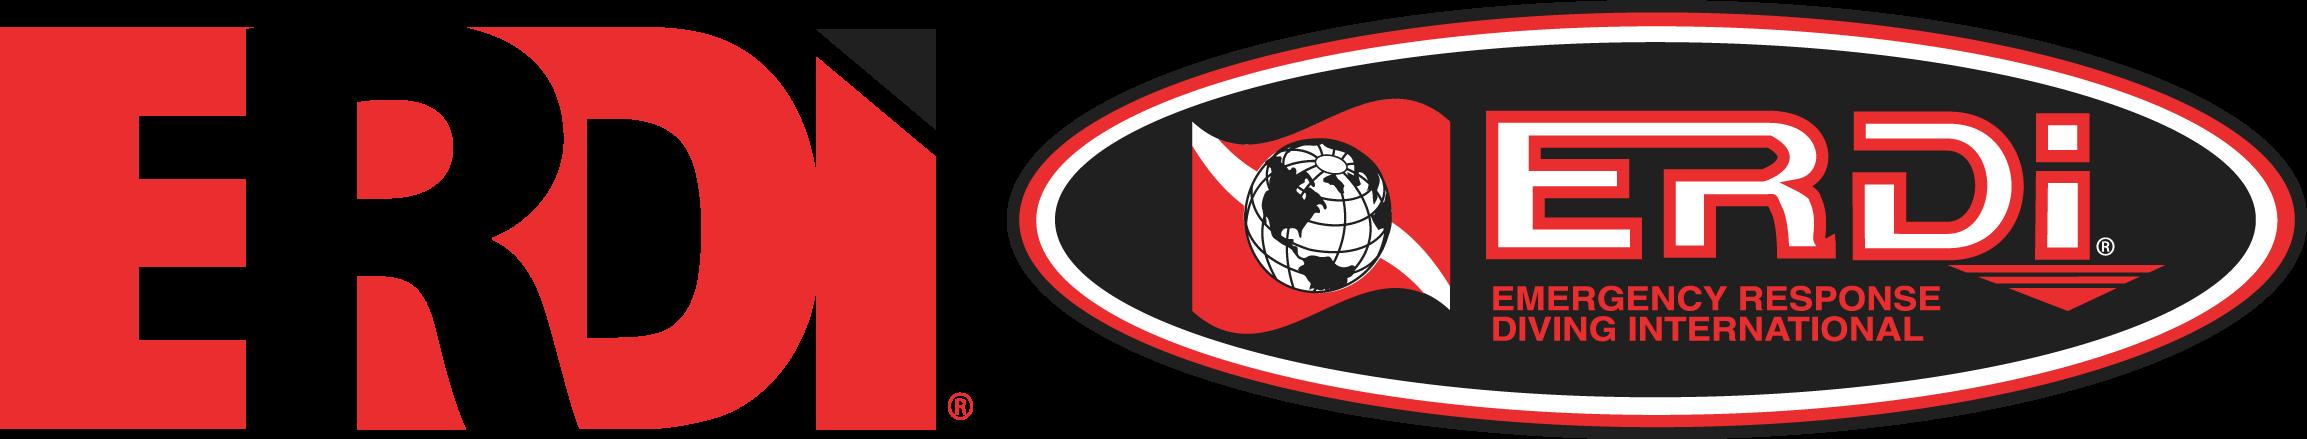 ERDI Combo Logo Color Large